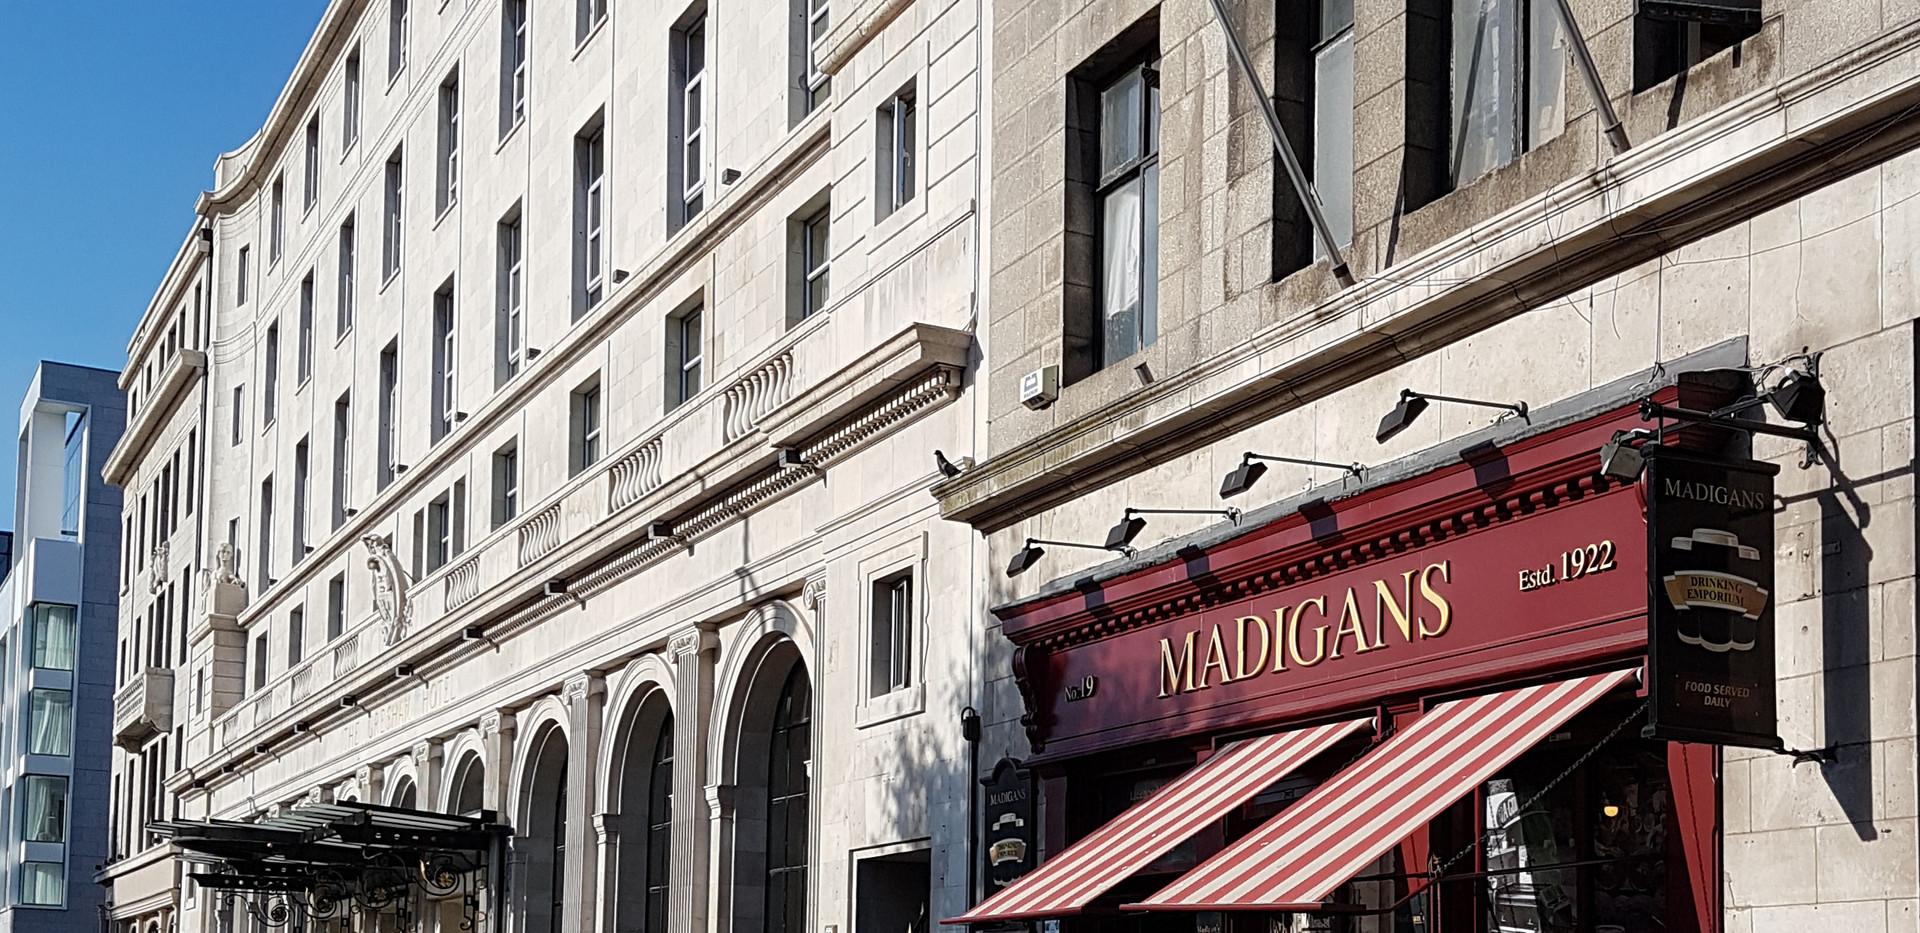 Madigan's Pub, 19 O'Connell Street, upr., Dublin, beside The Gresham Hotel,